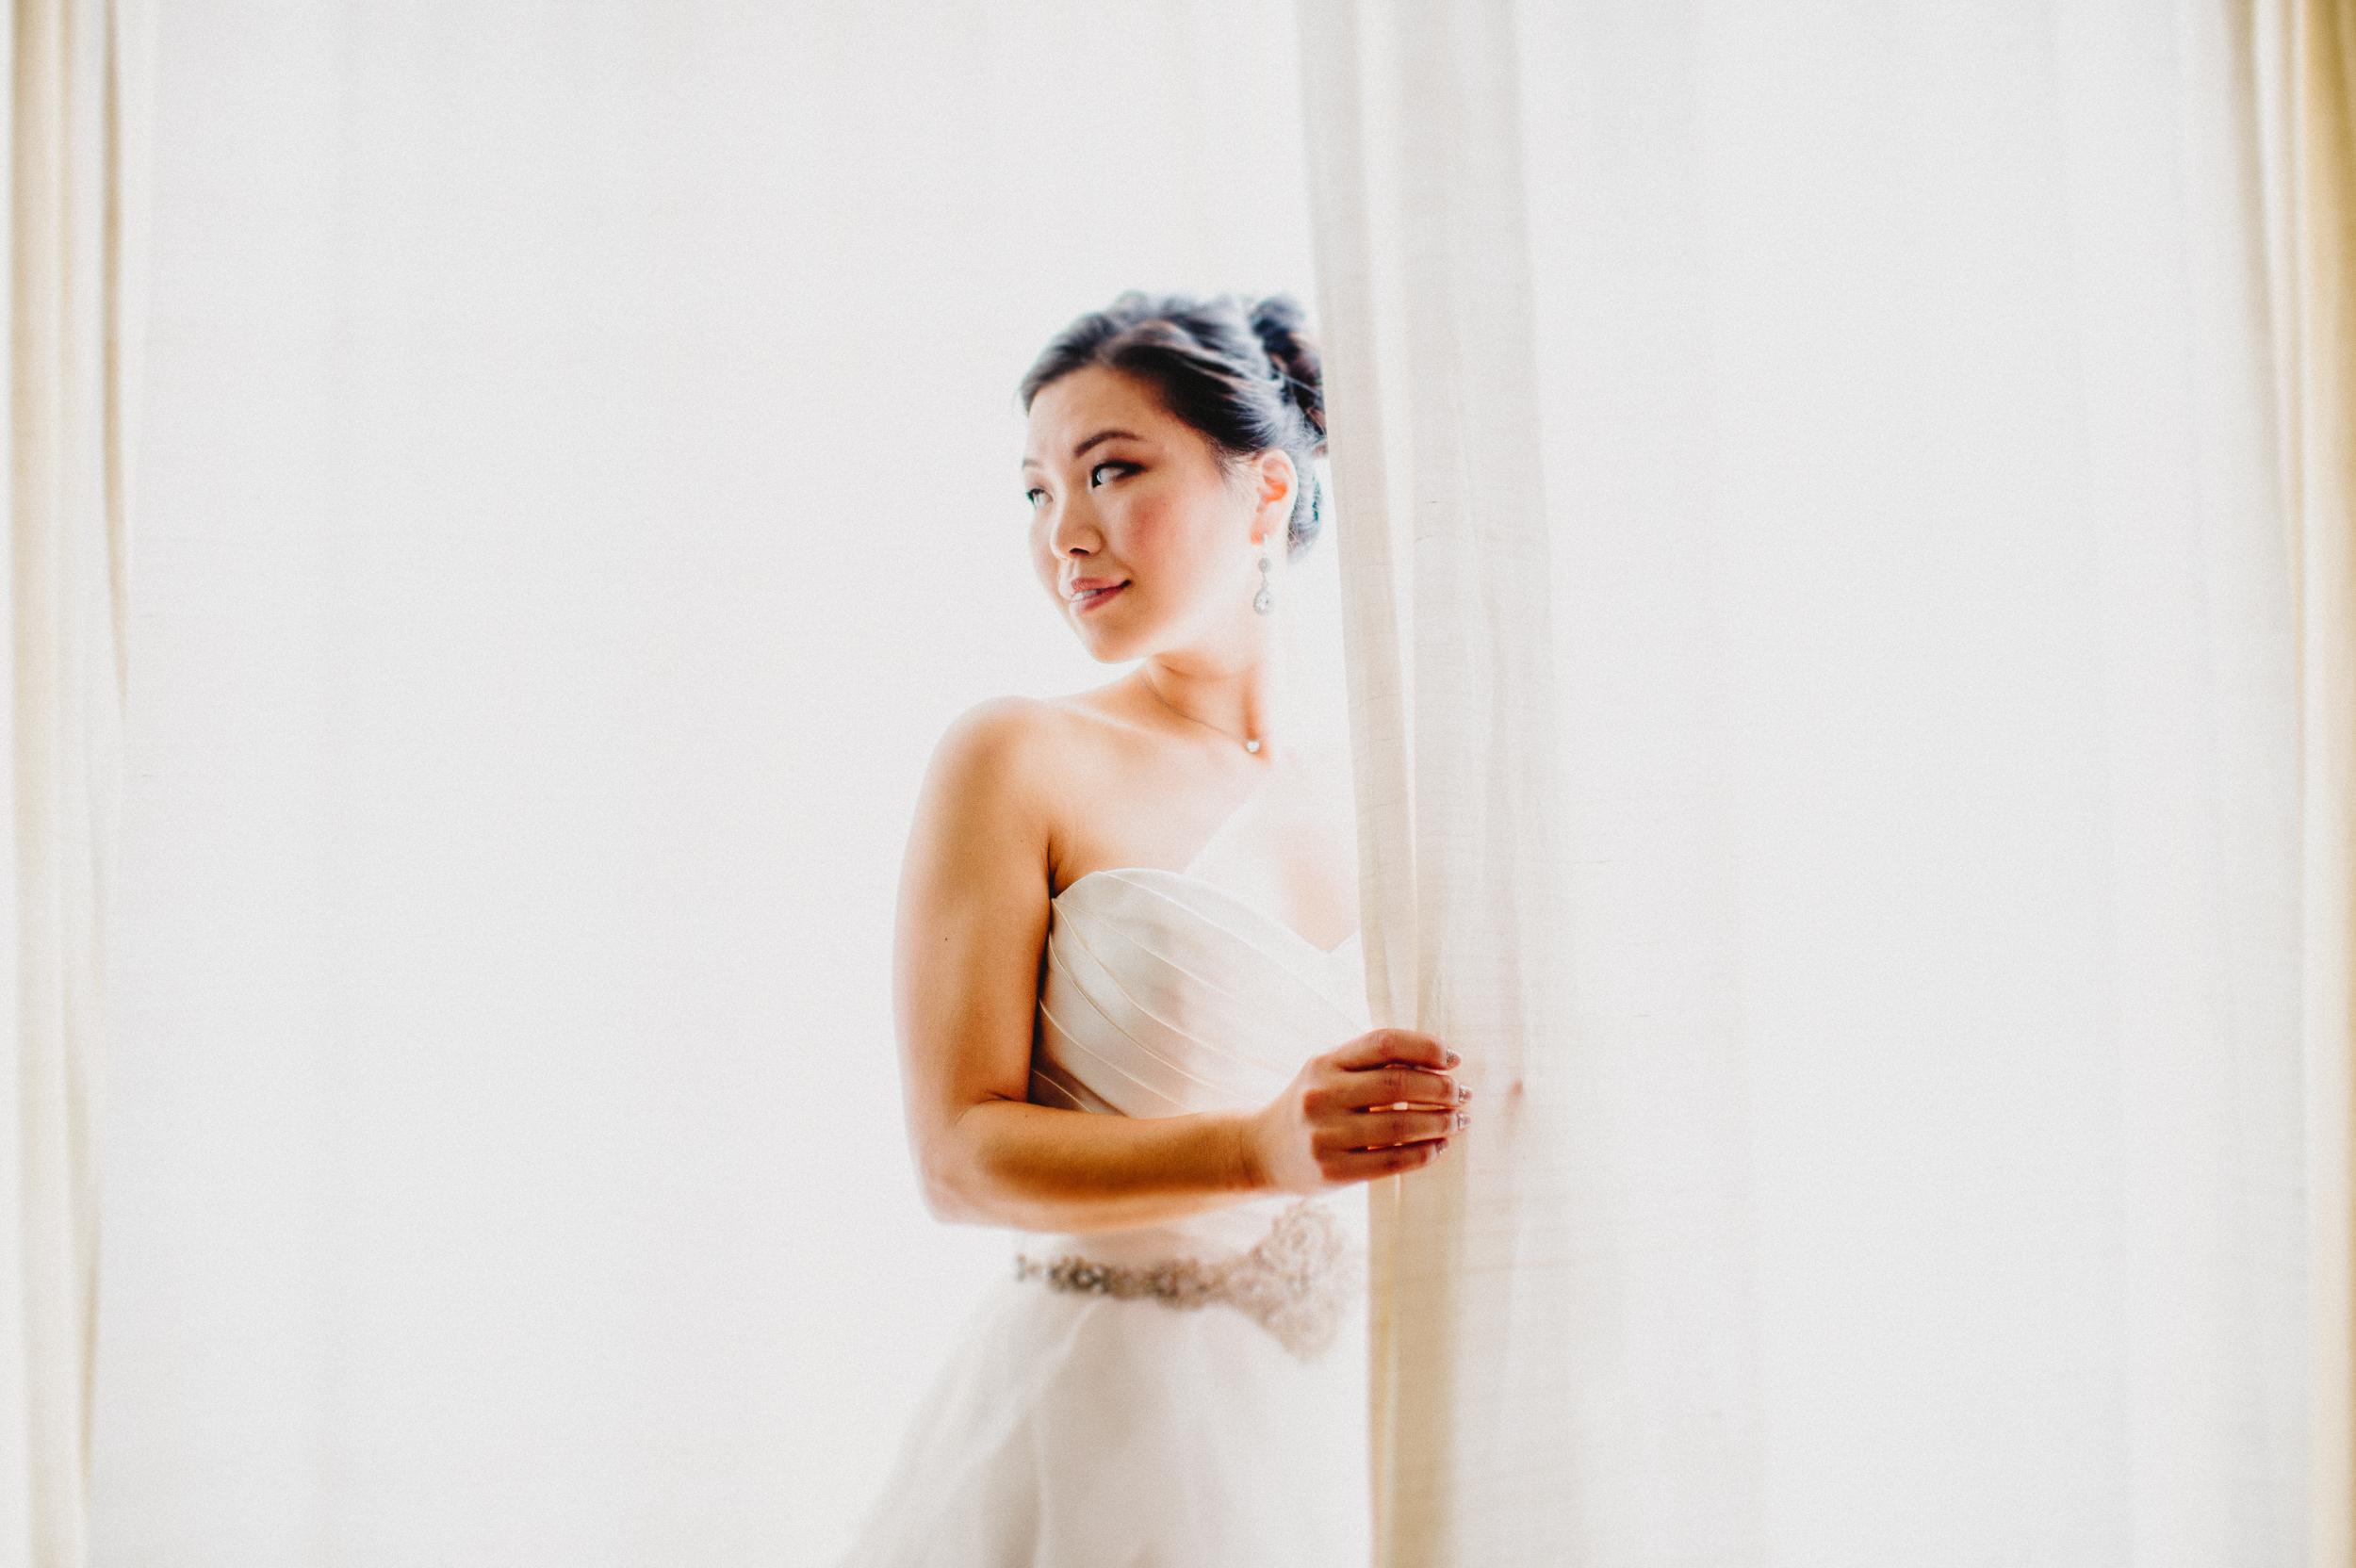 union-trust-philadelphia-wedding-photographer-29.jpg